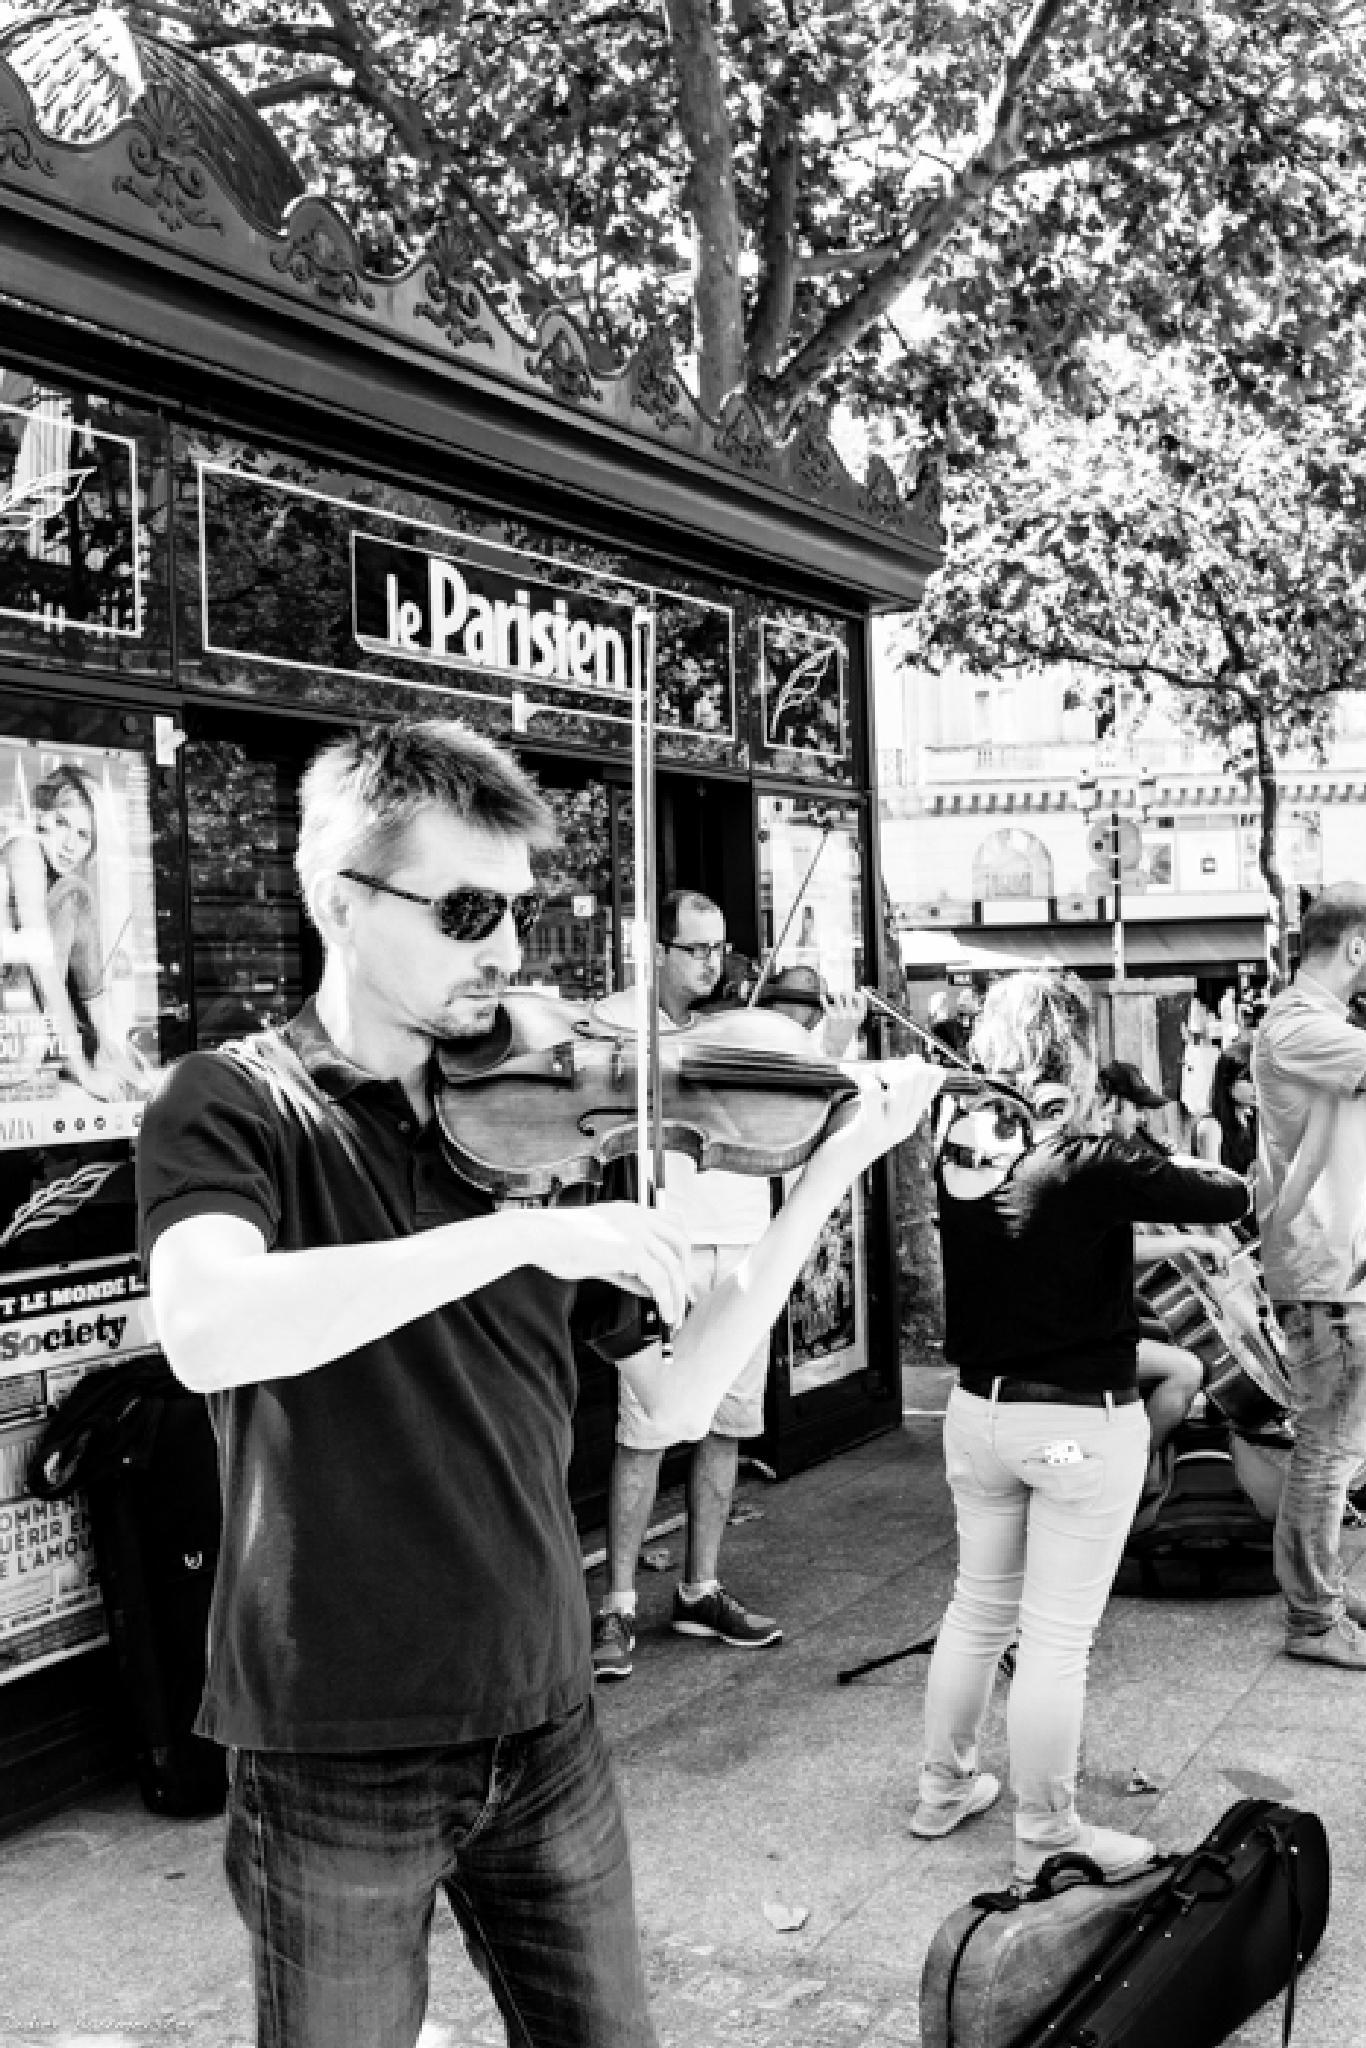 Street Musician by Jibril.Caploncour